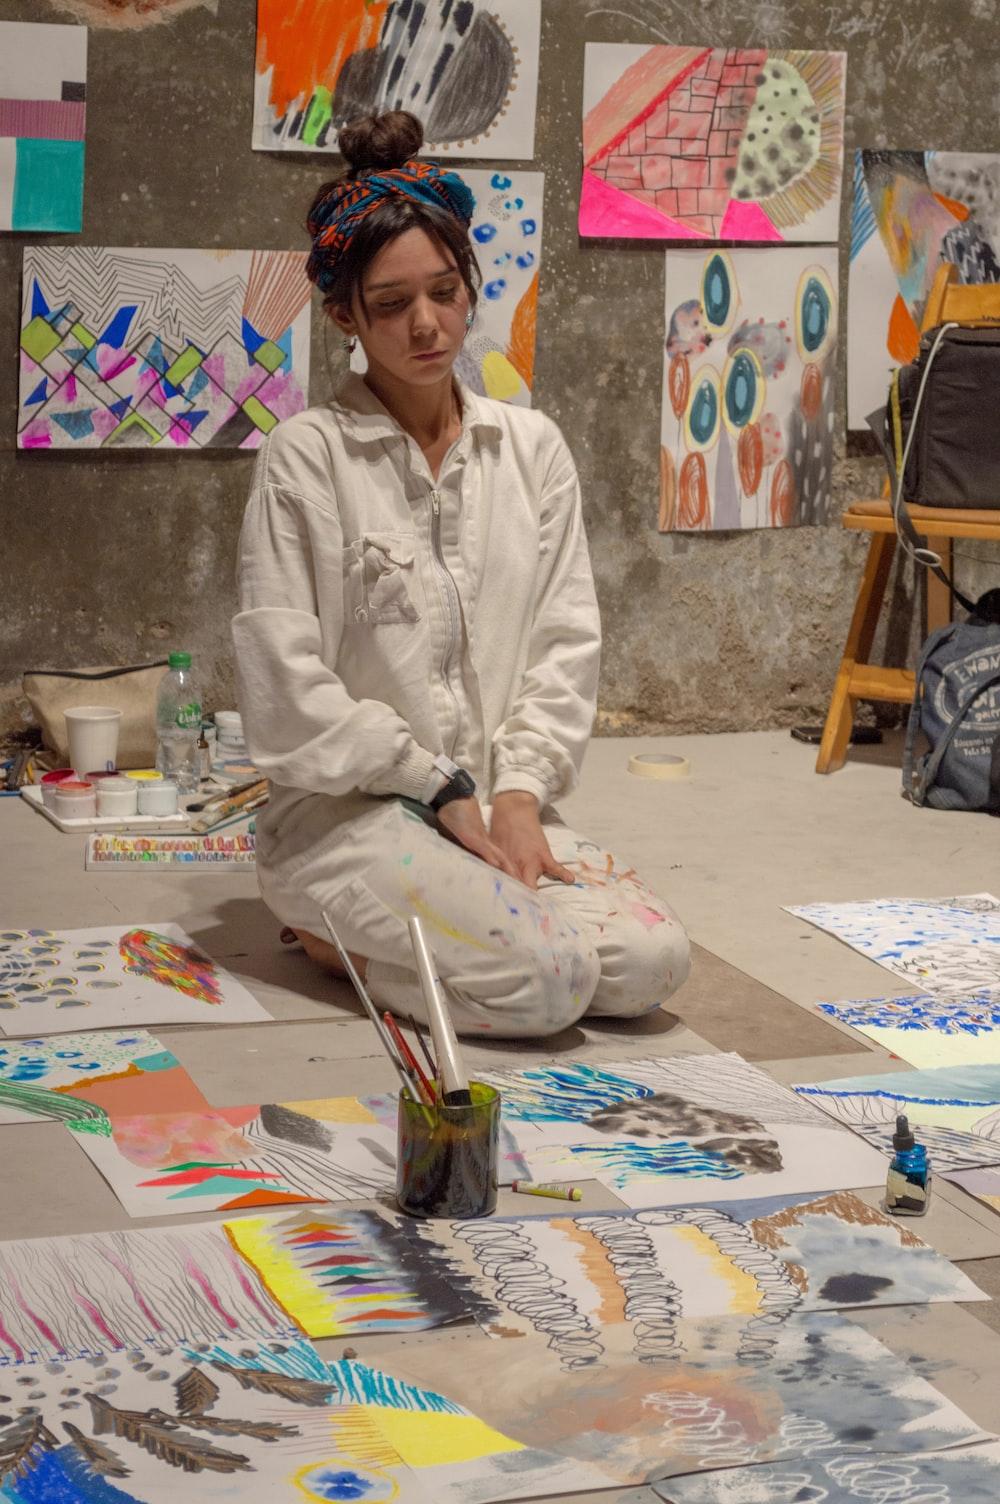 woman sitting near painting lot